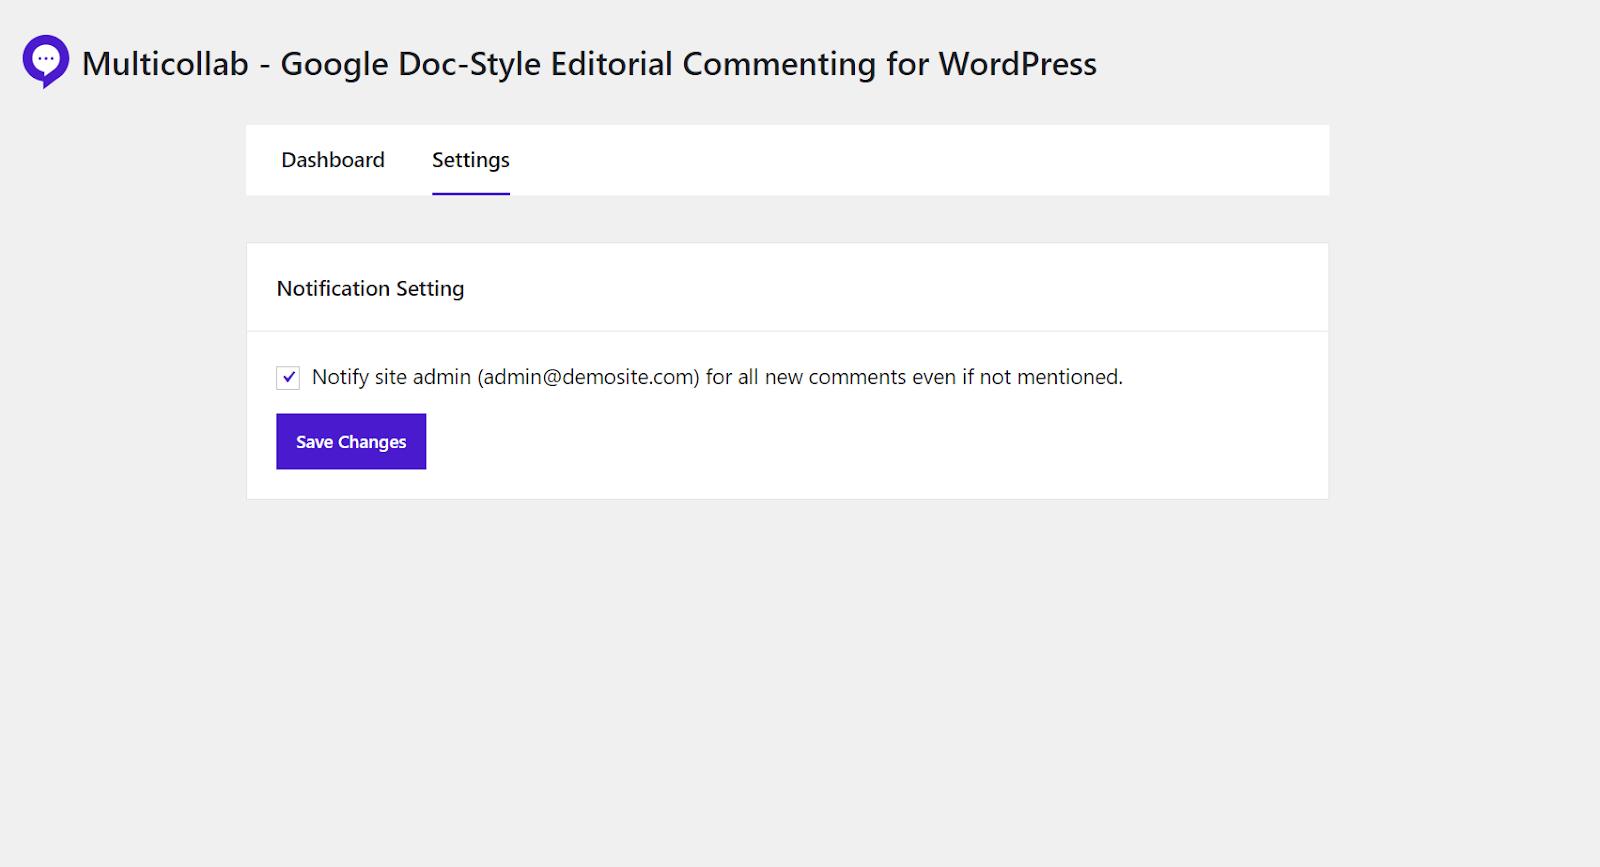 Multicollab - Google Doc Style Editorial